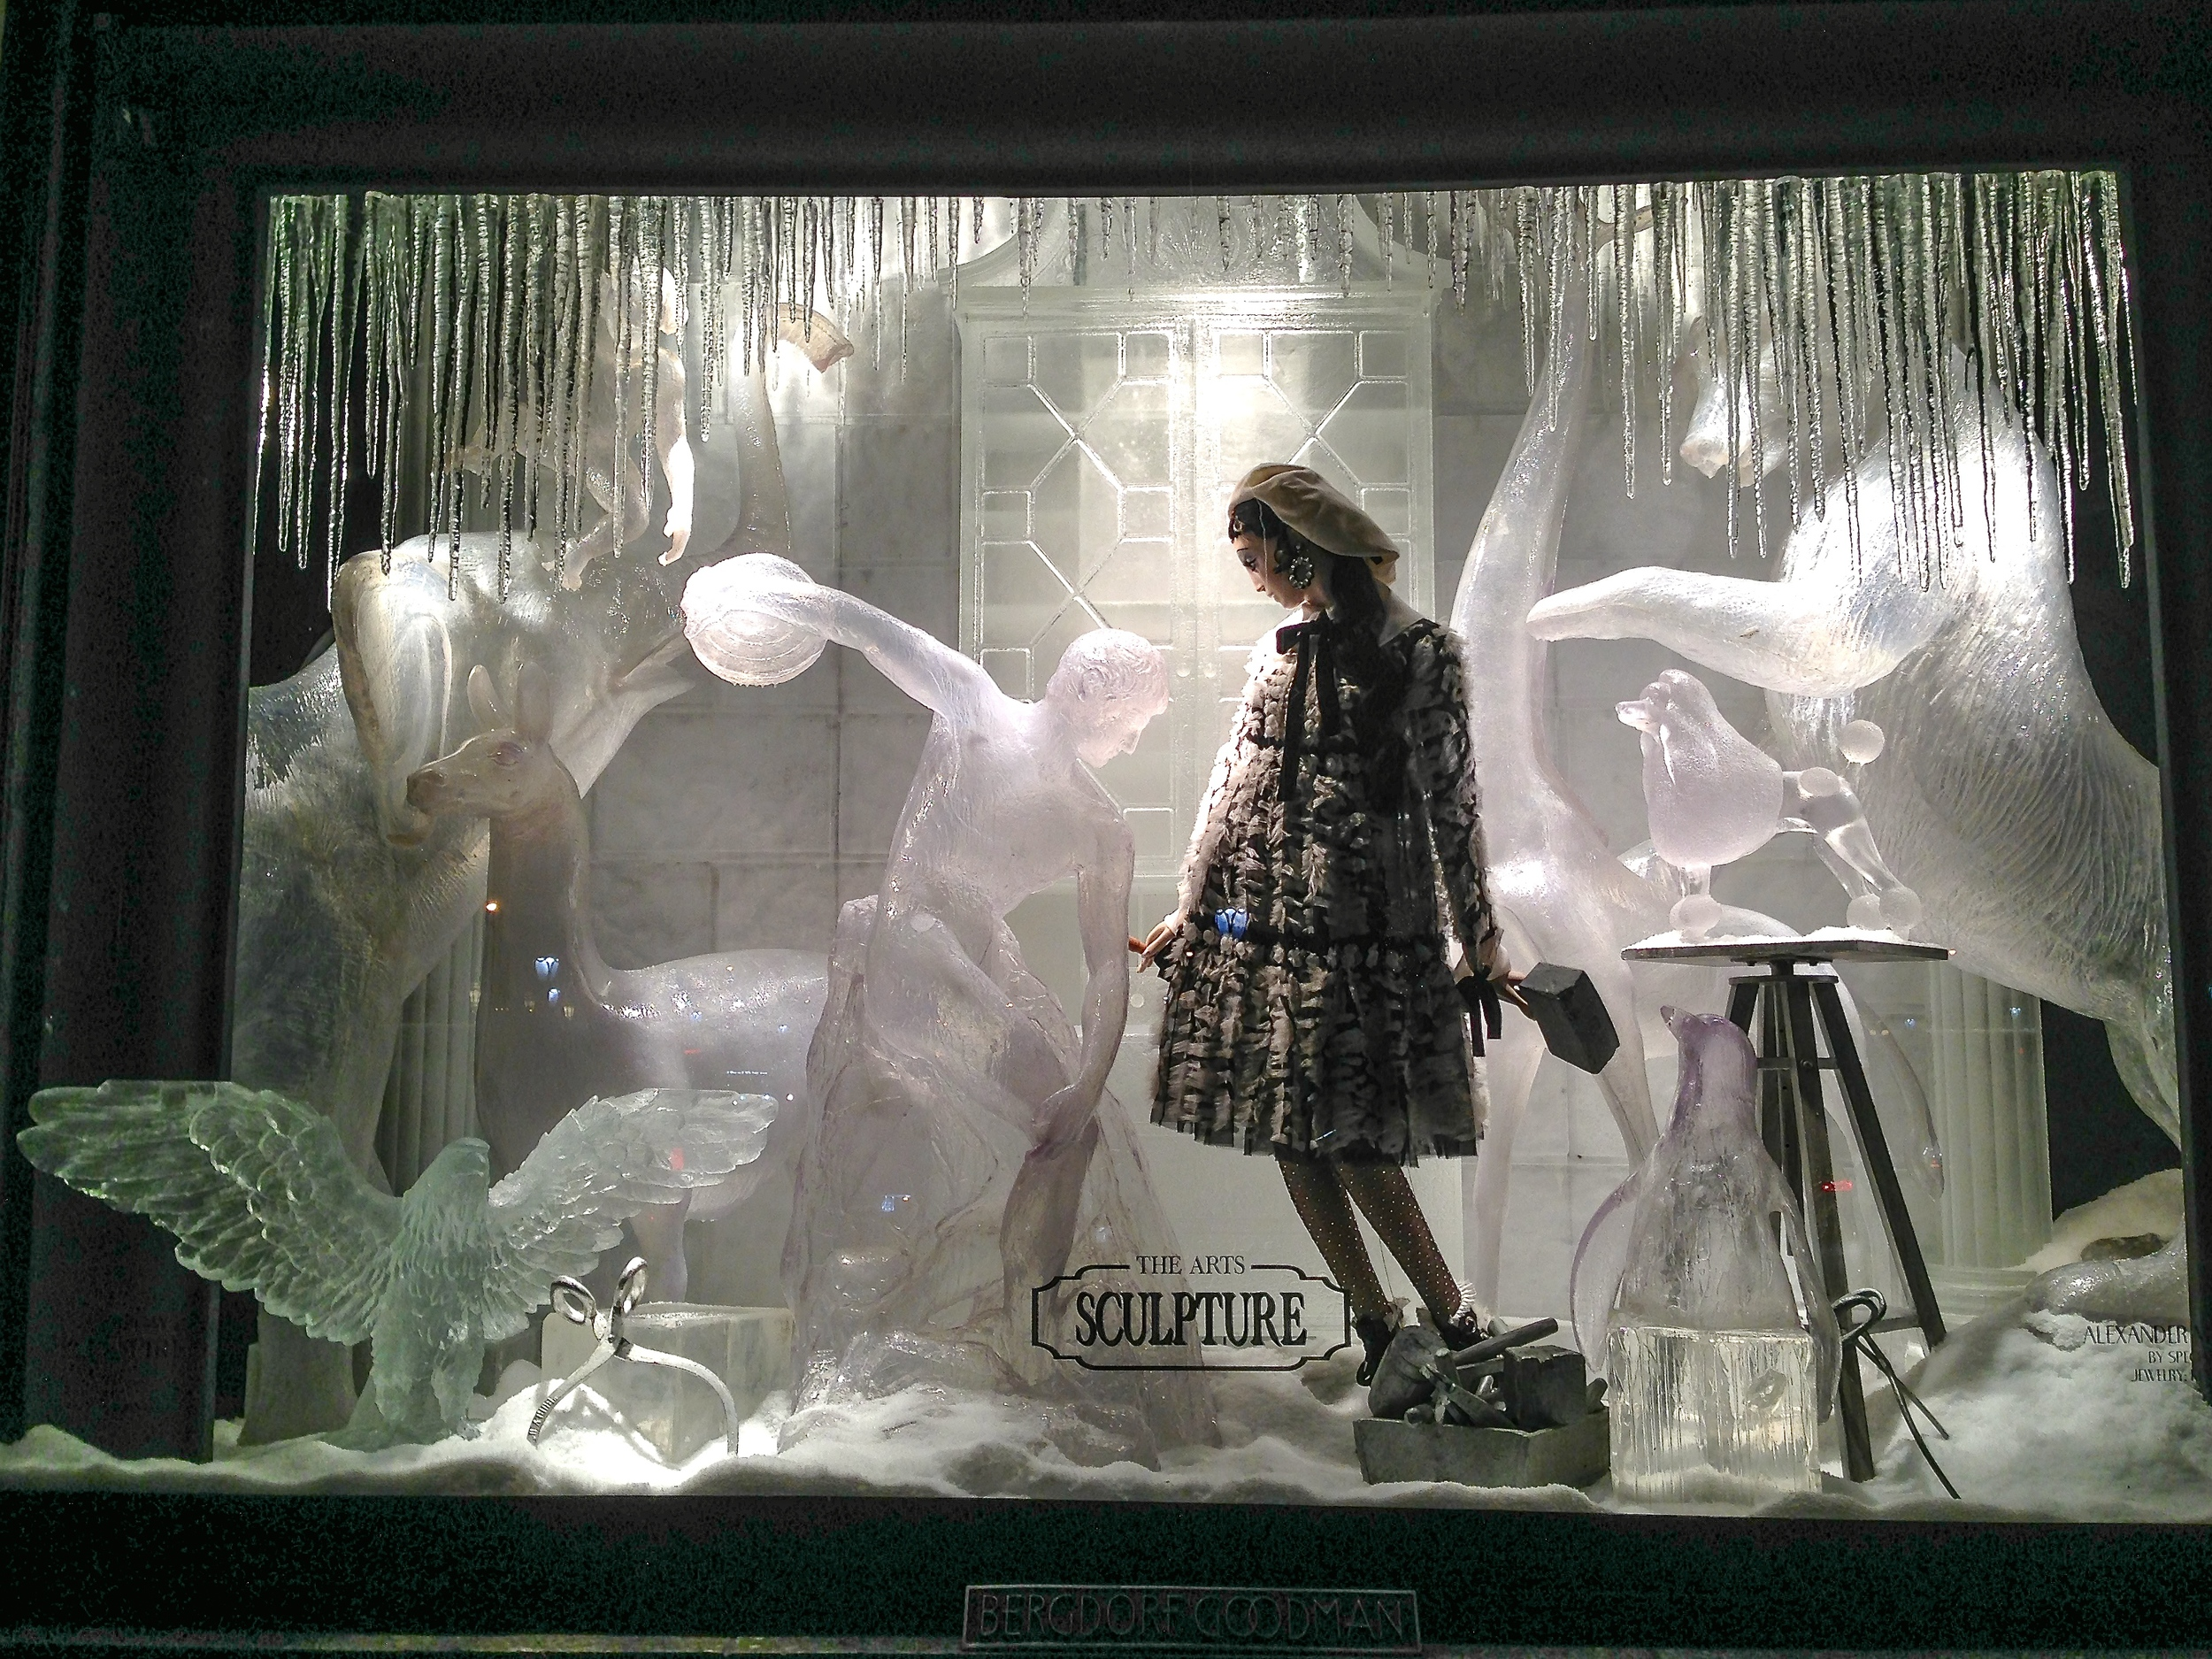 A Christmas window display at Bergdorf Goodman, a high-end department store on New York's 5th Avenue. (Photo: Joseph Kellard)